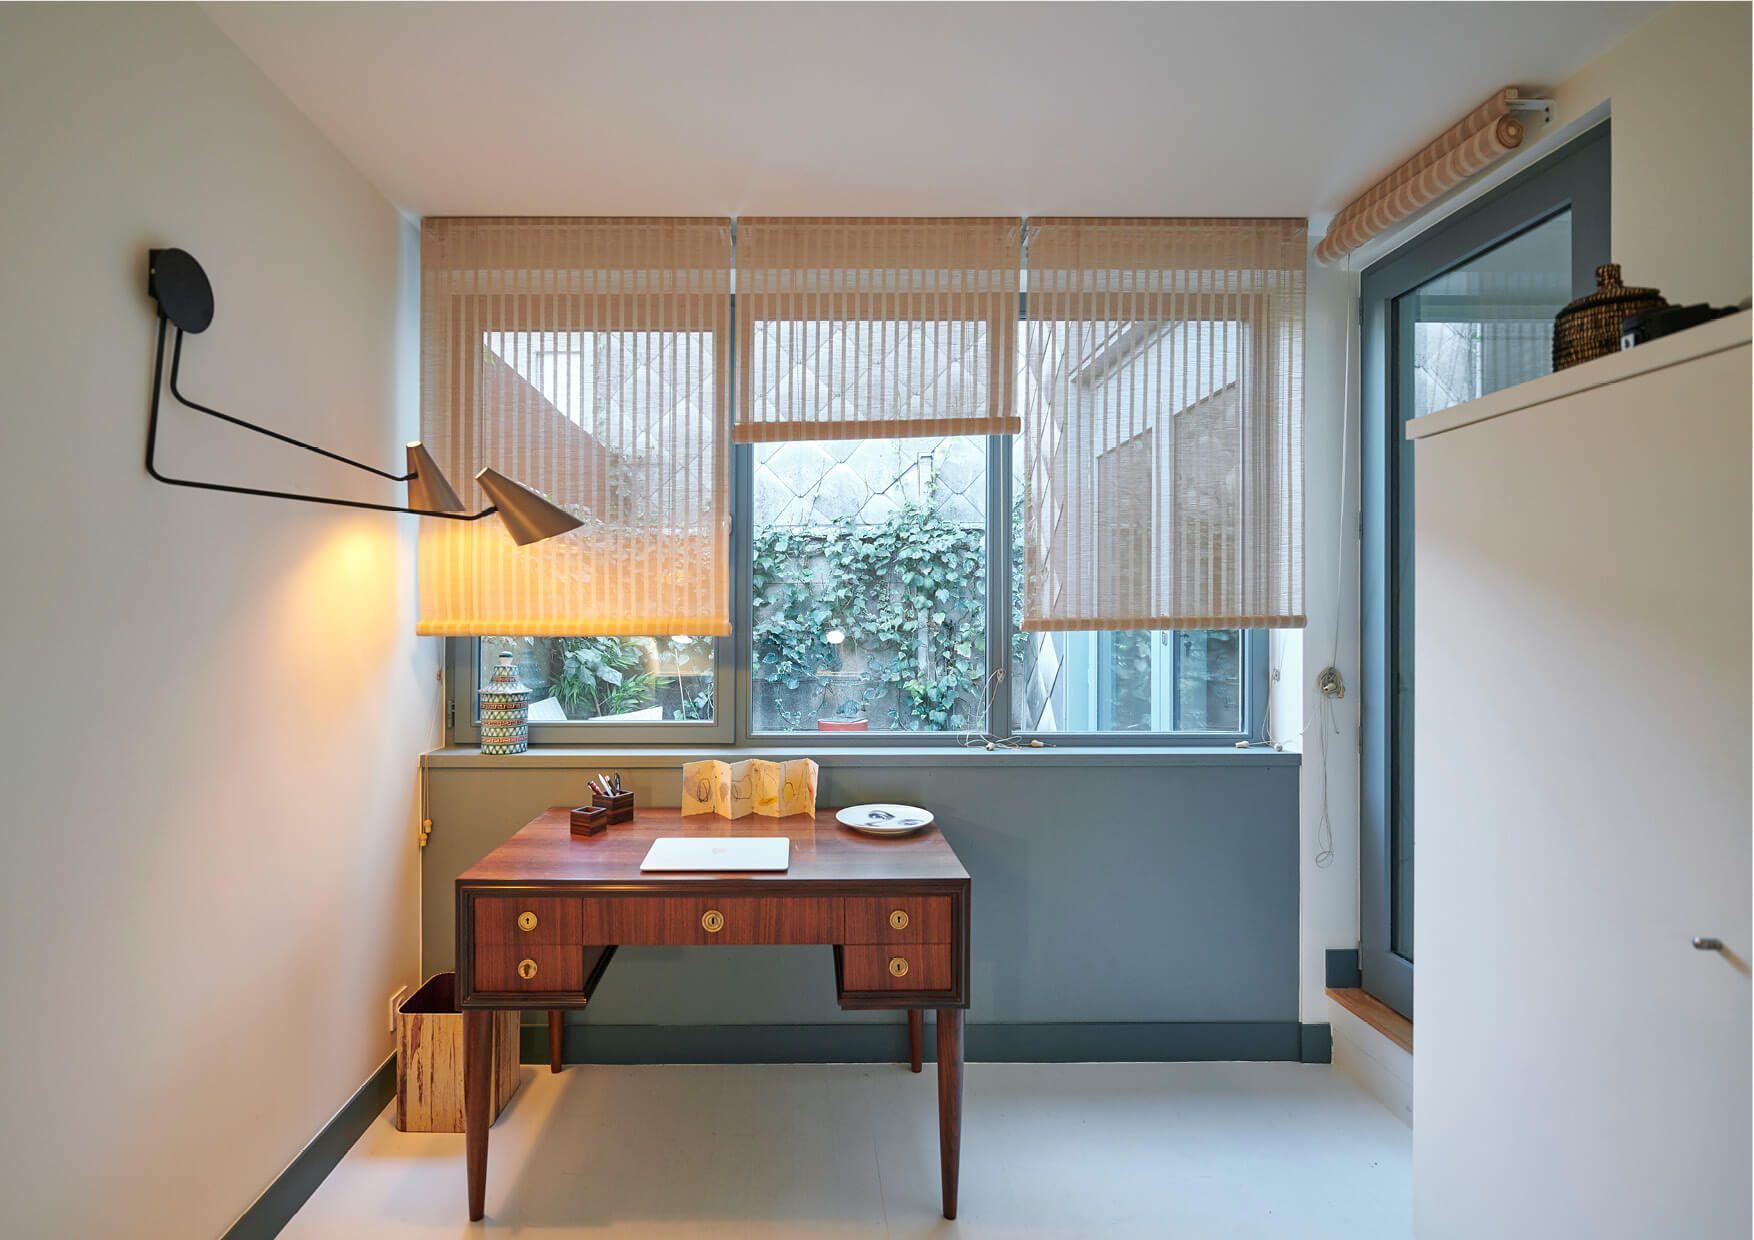 39+ Garage transforme en chambre ideas in 2021